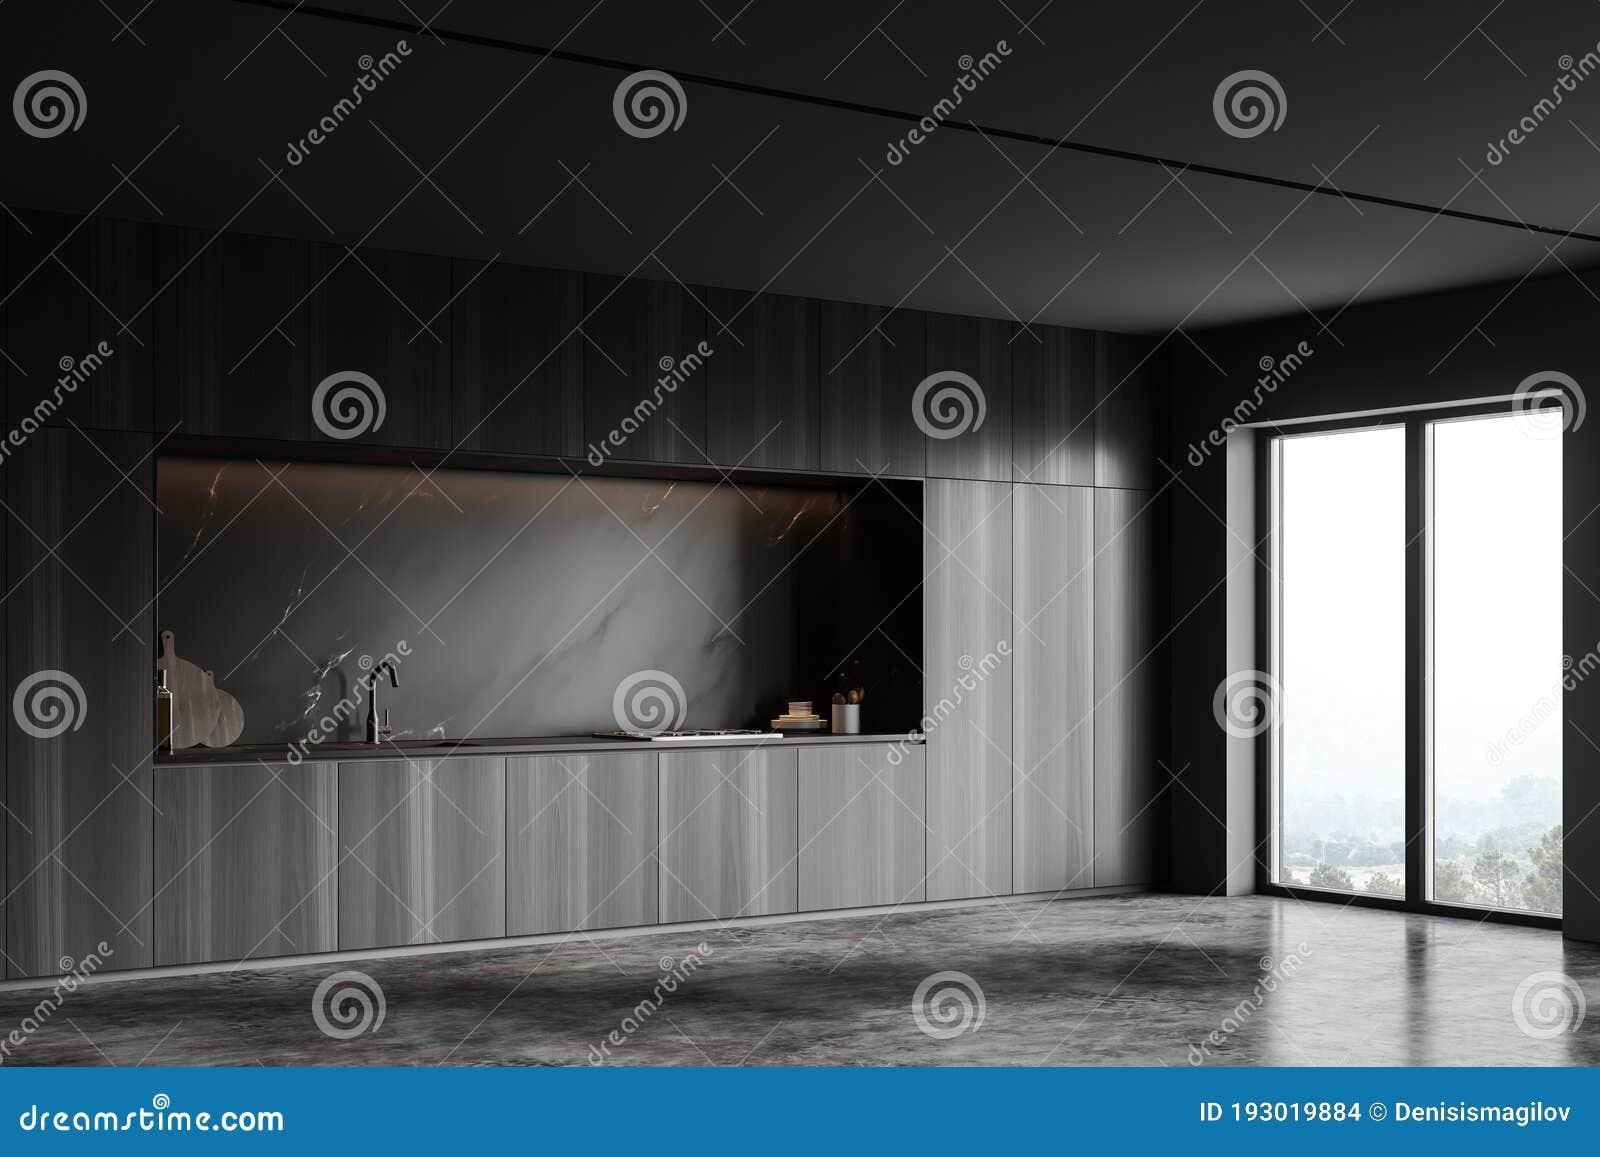 Cabinets In Black Marble Kitchen Corner Stock Illustration Illustration Of Hood Kitchen 193019884